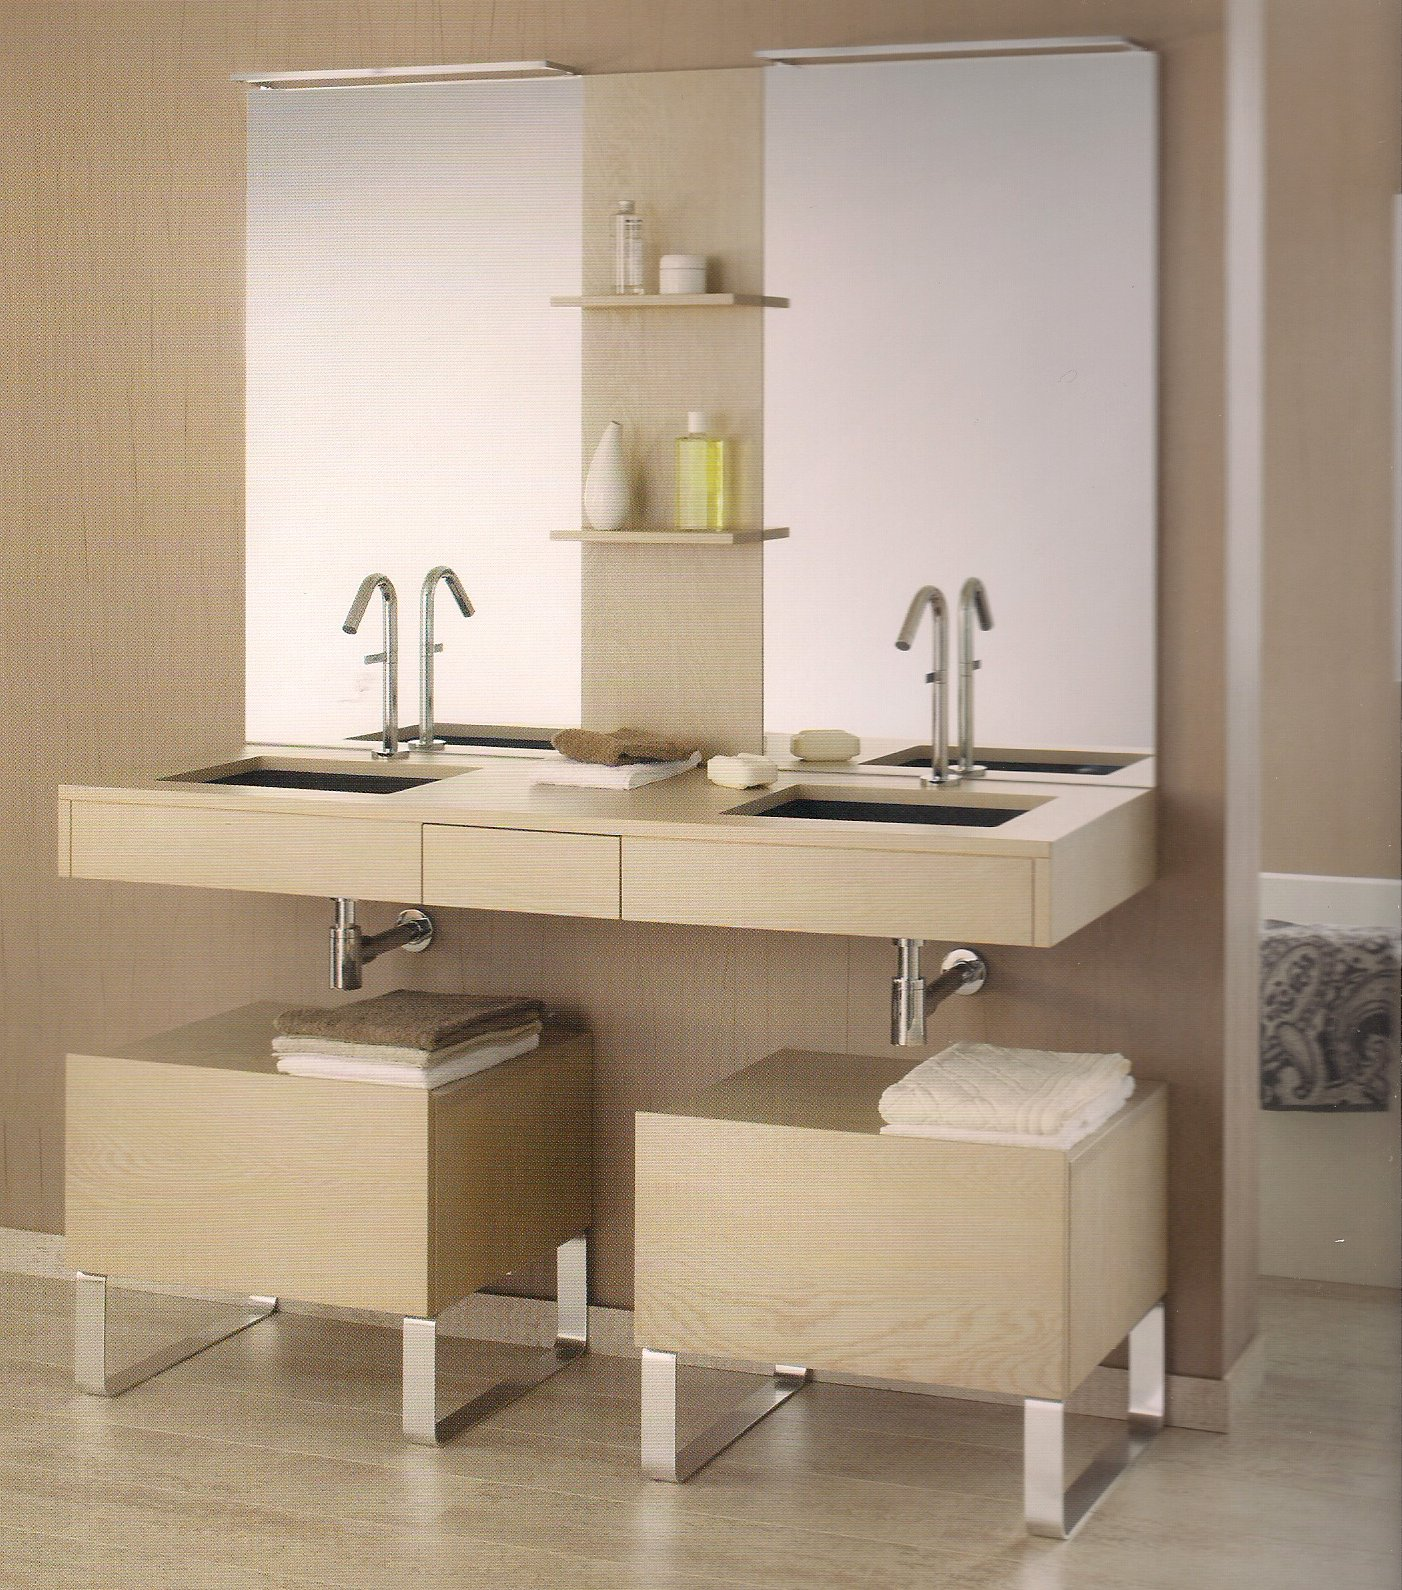 Aqualys burdin bossert prolians besancon: meuble salle de bains ...